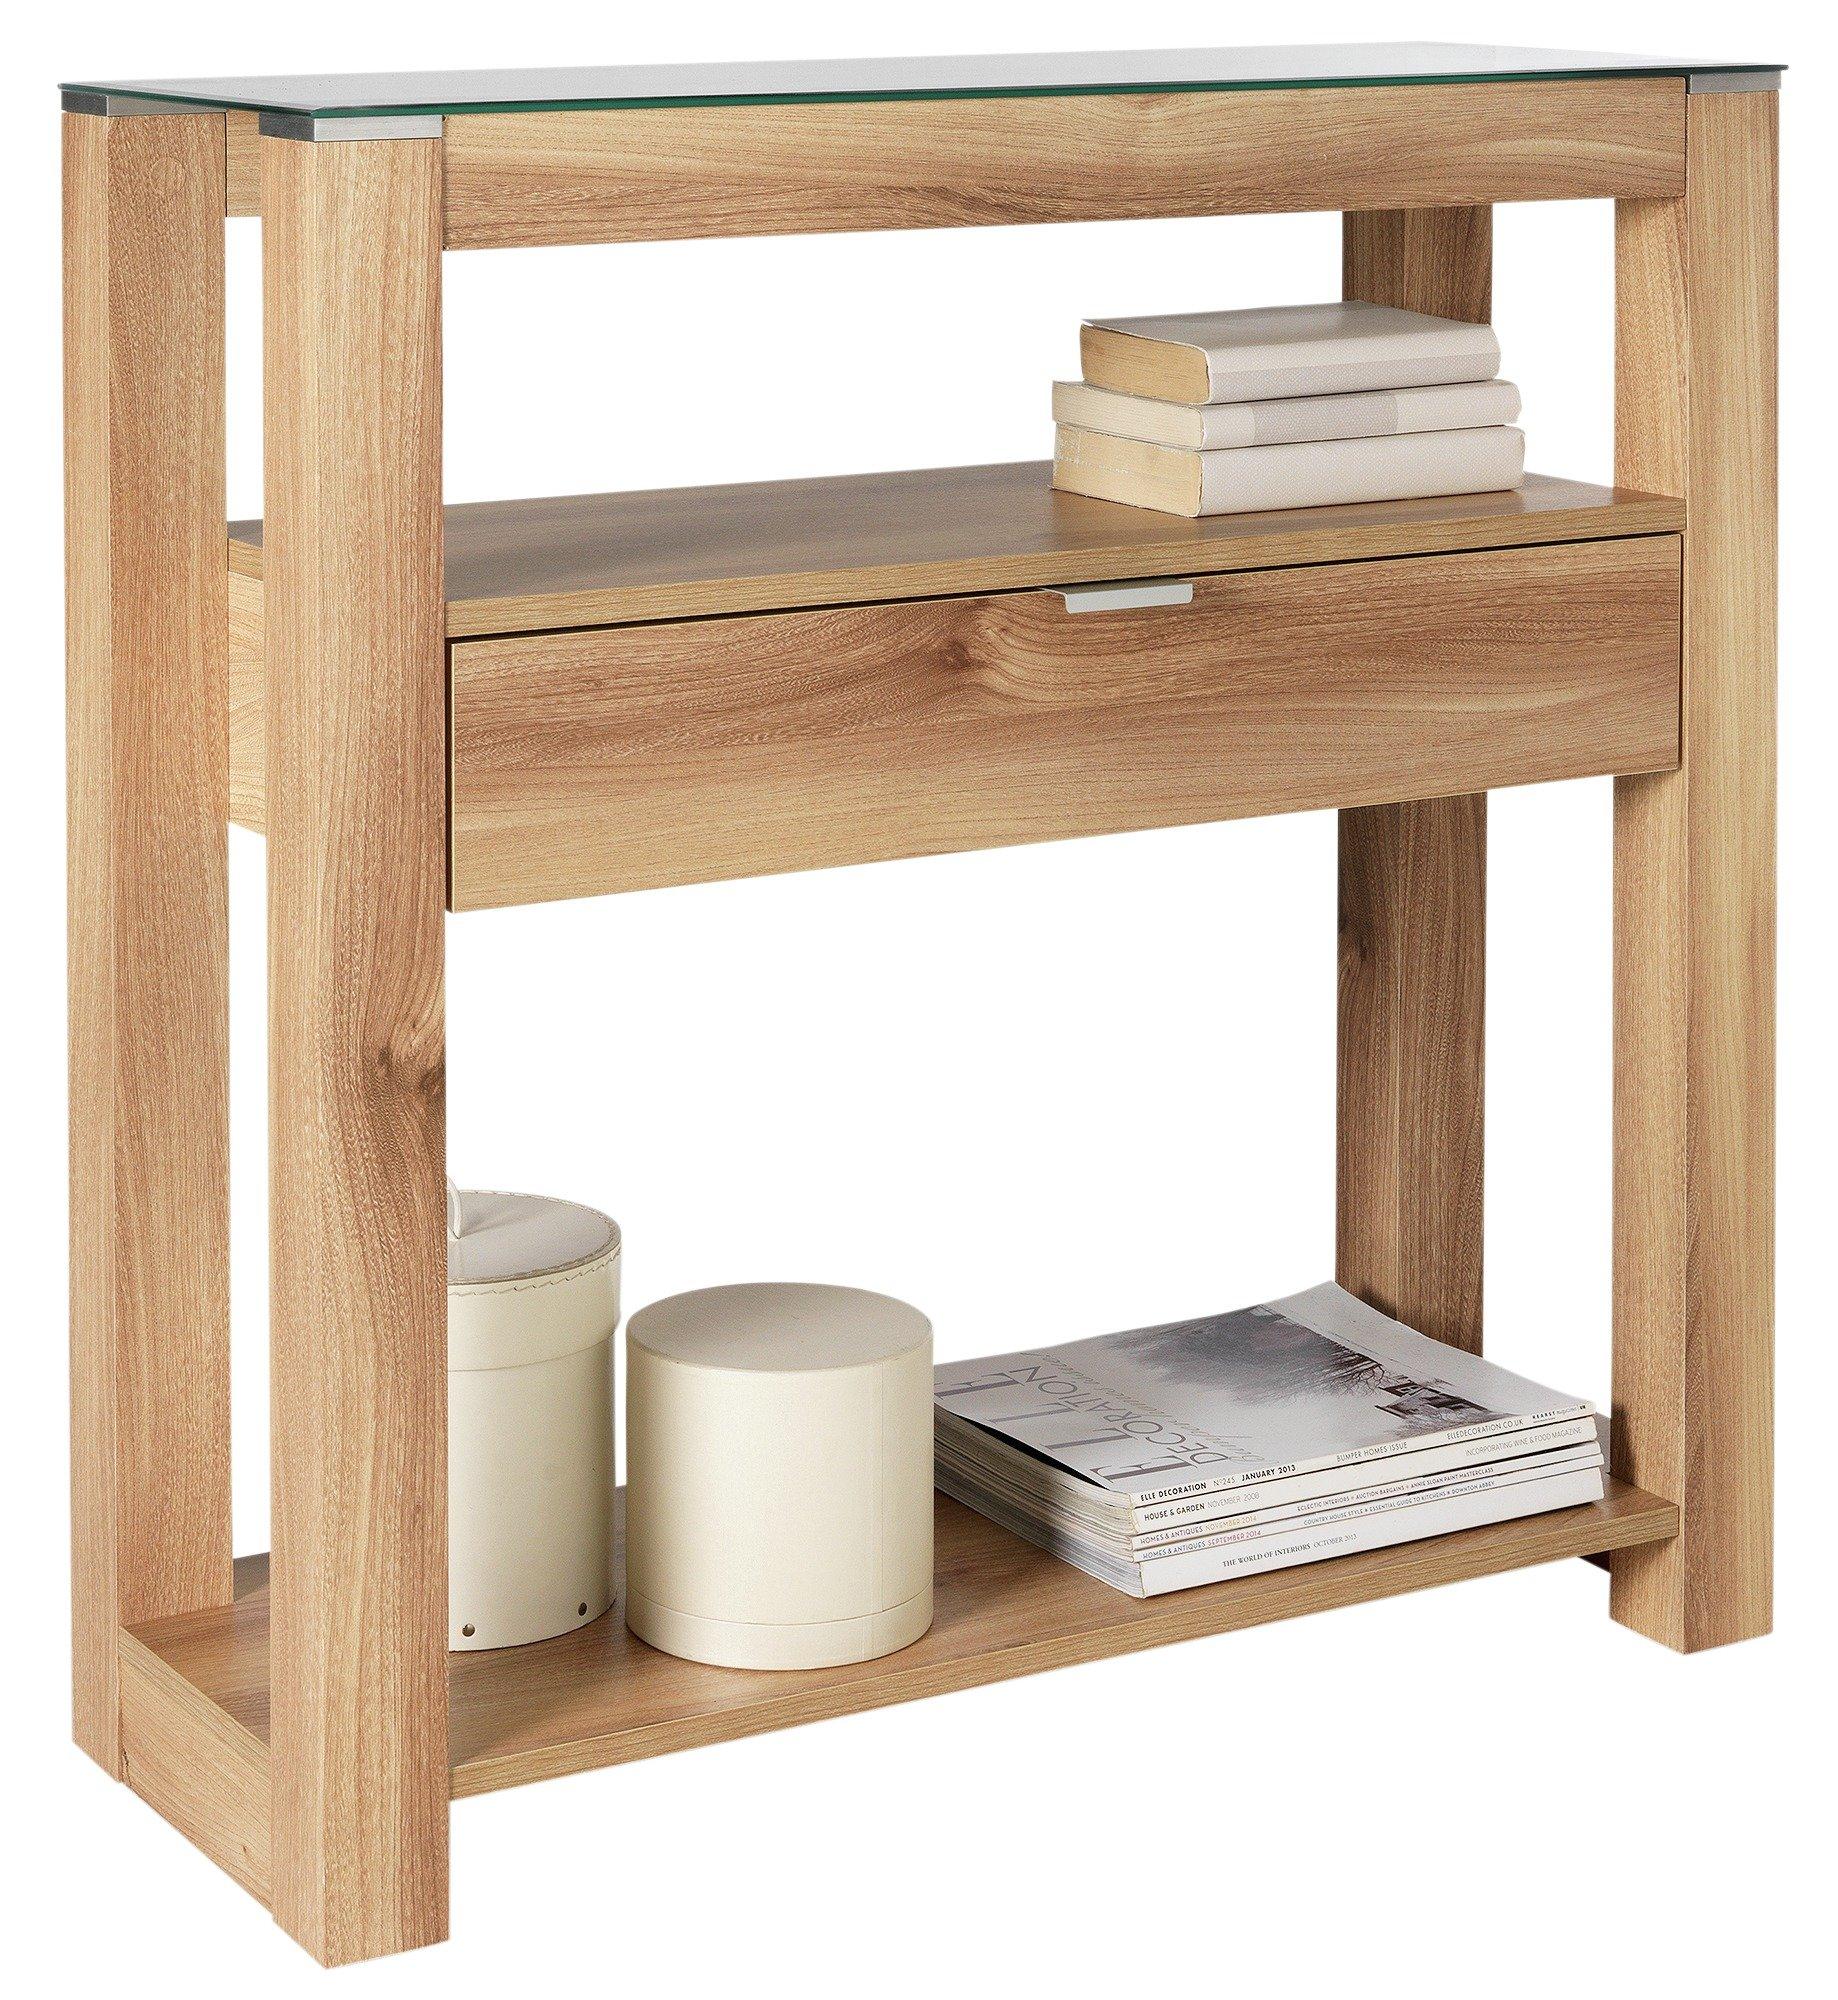 Argos Home Cubic Console Table - Oak Finish